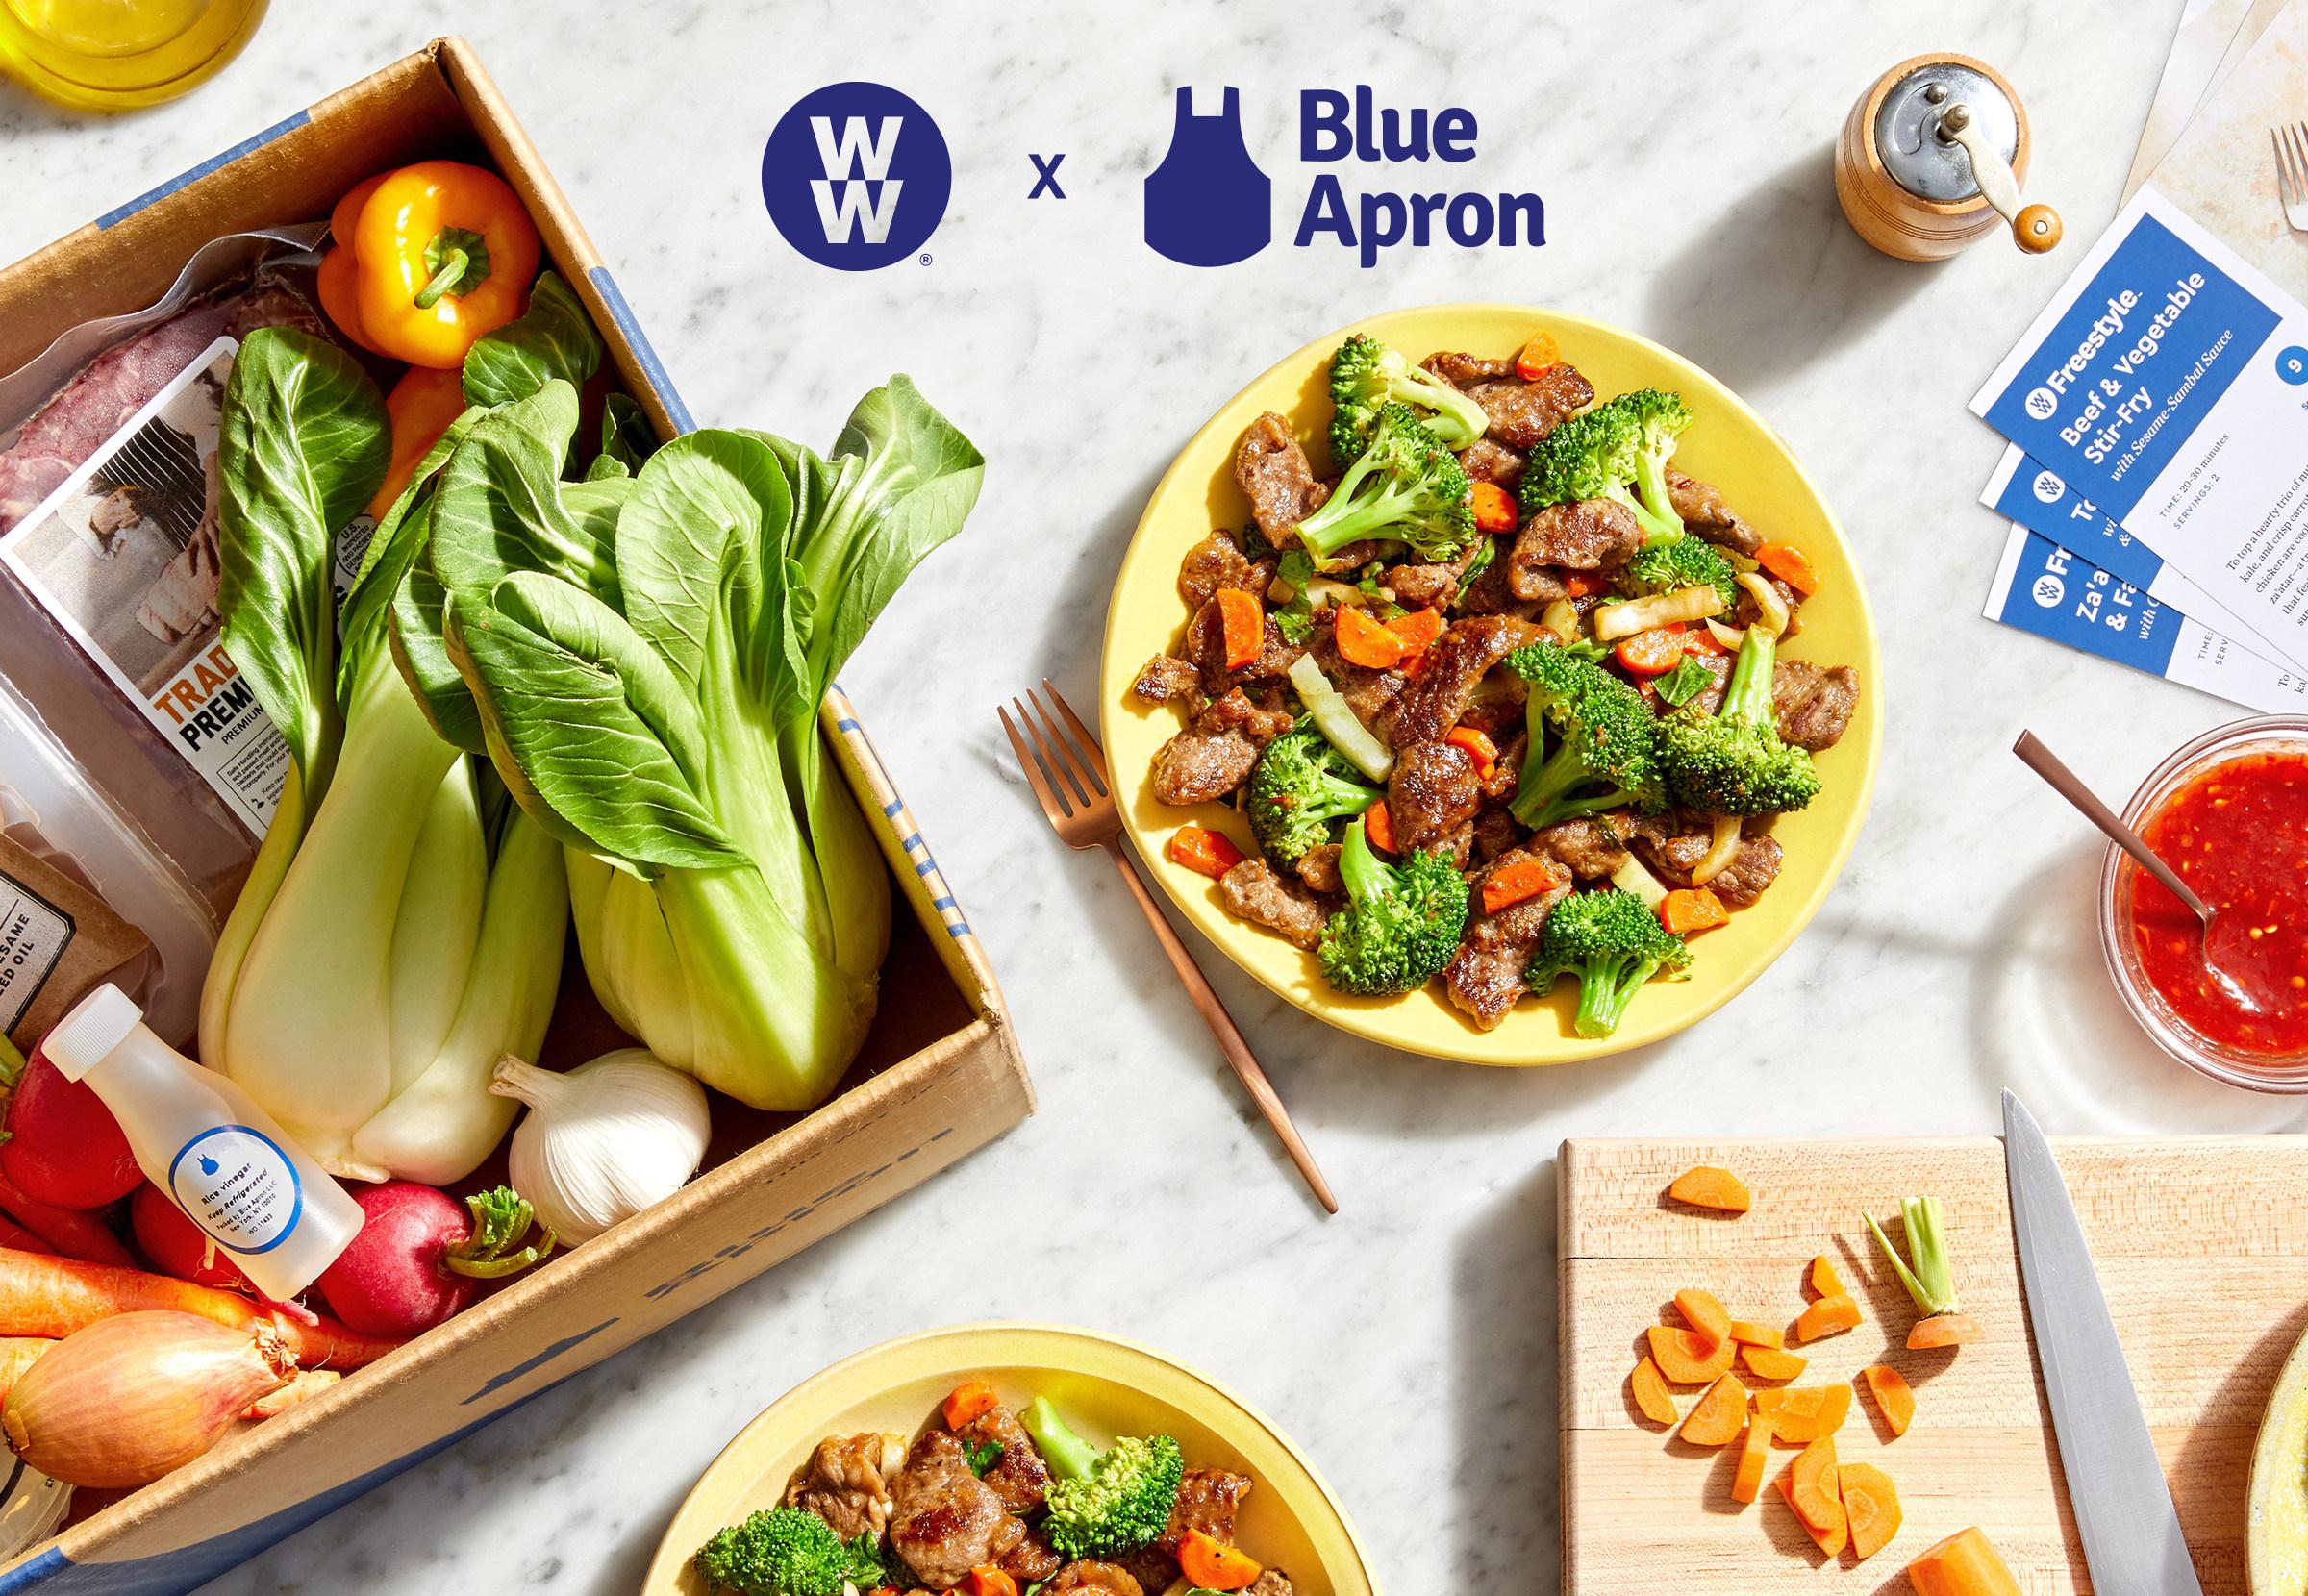 WW x Blue Apron meal kit